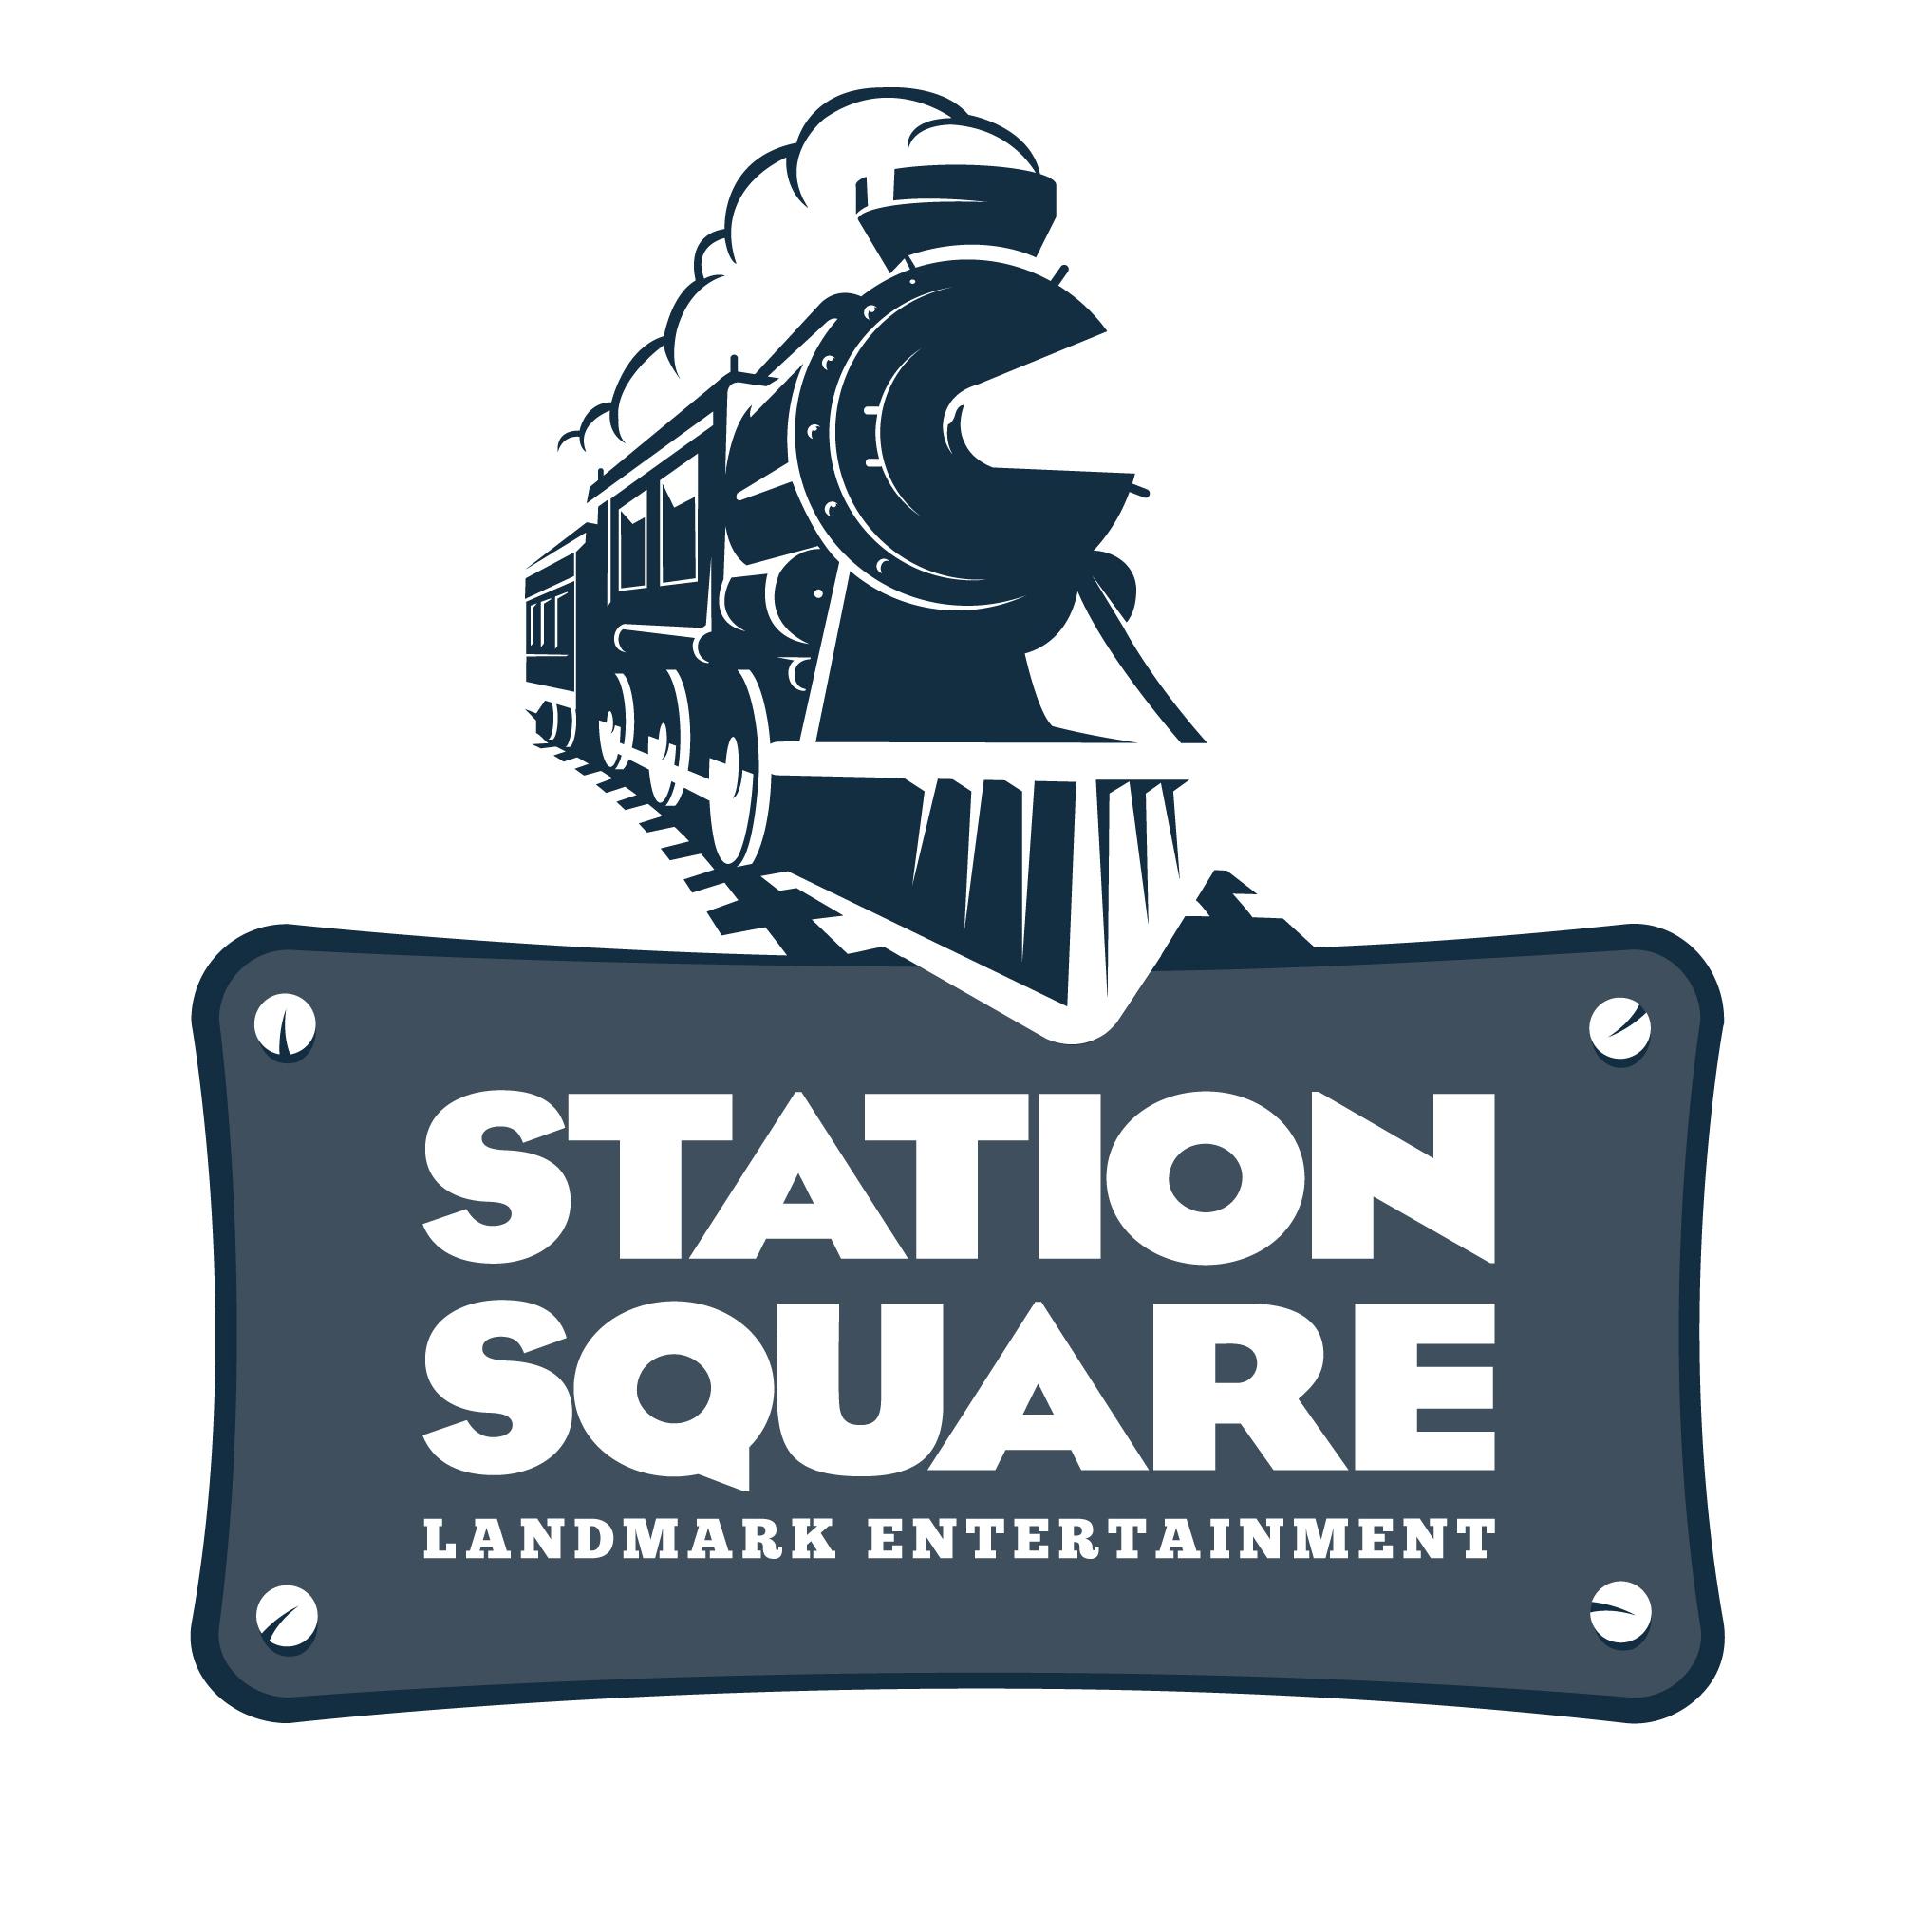 station square 2015